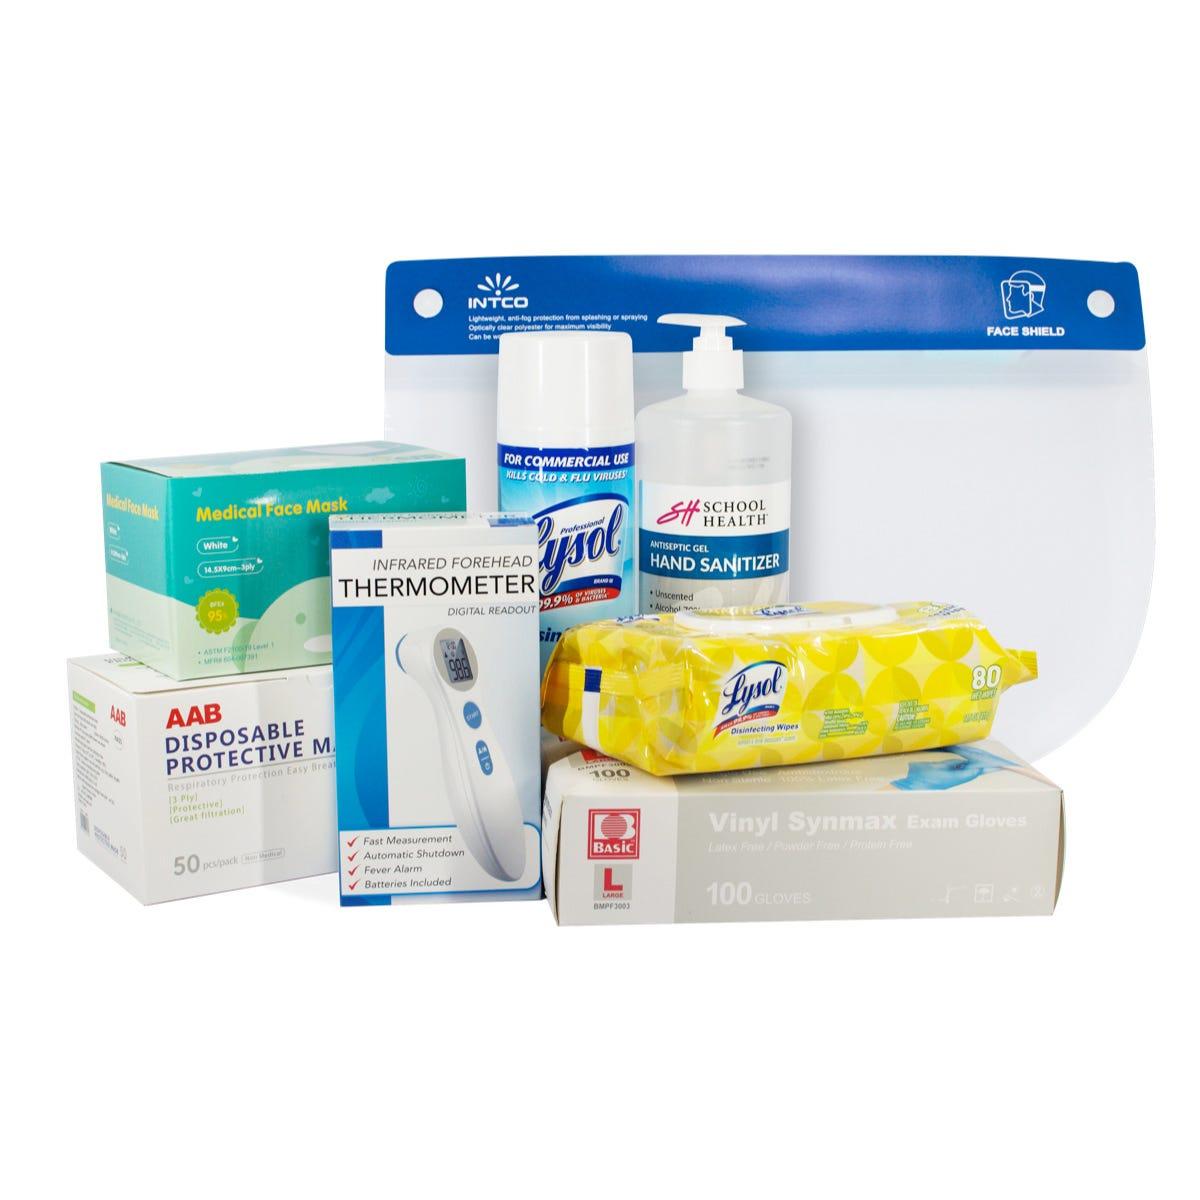 School Health Classroom Protection Kit